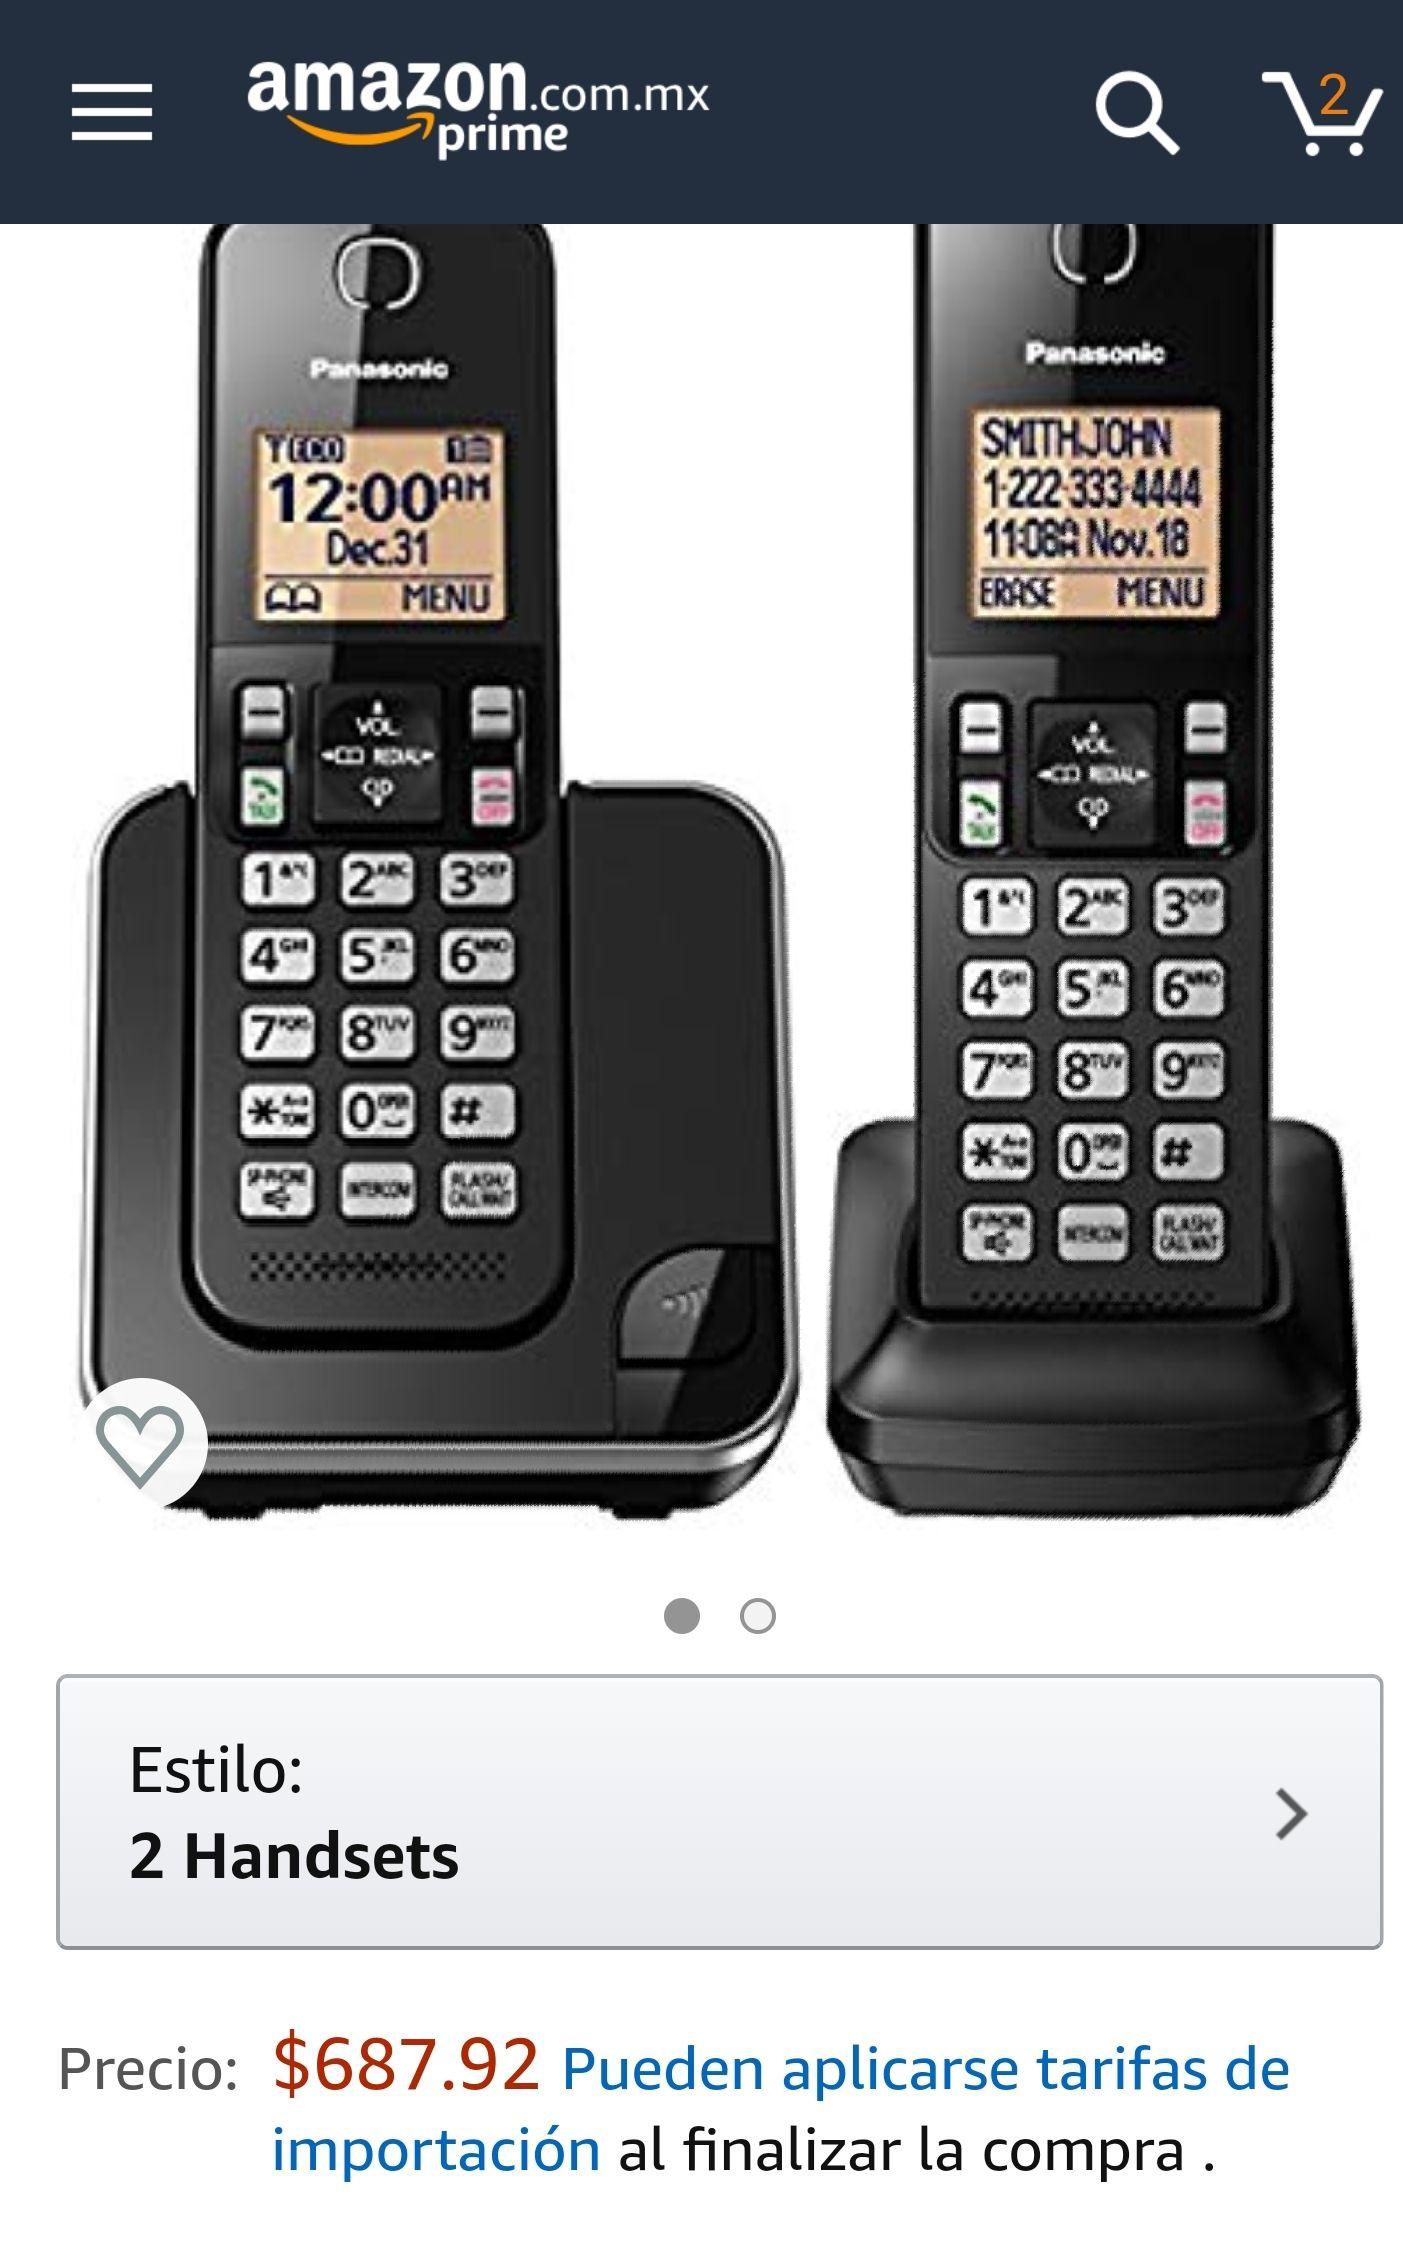 Amazon teléfonos inalámbricos Panasonic